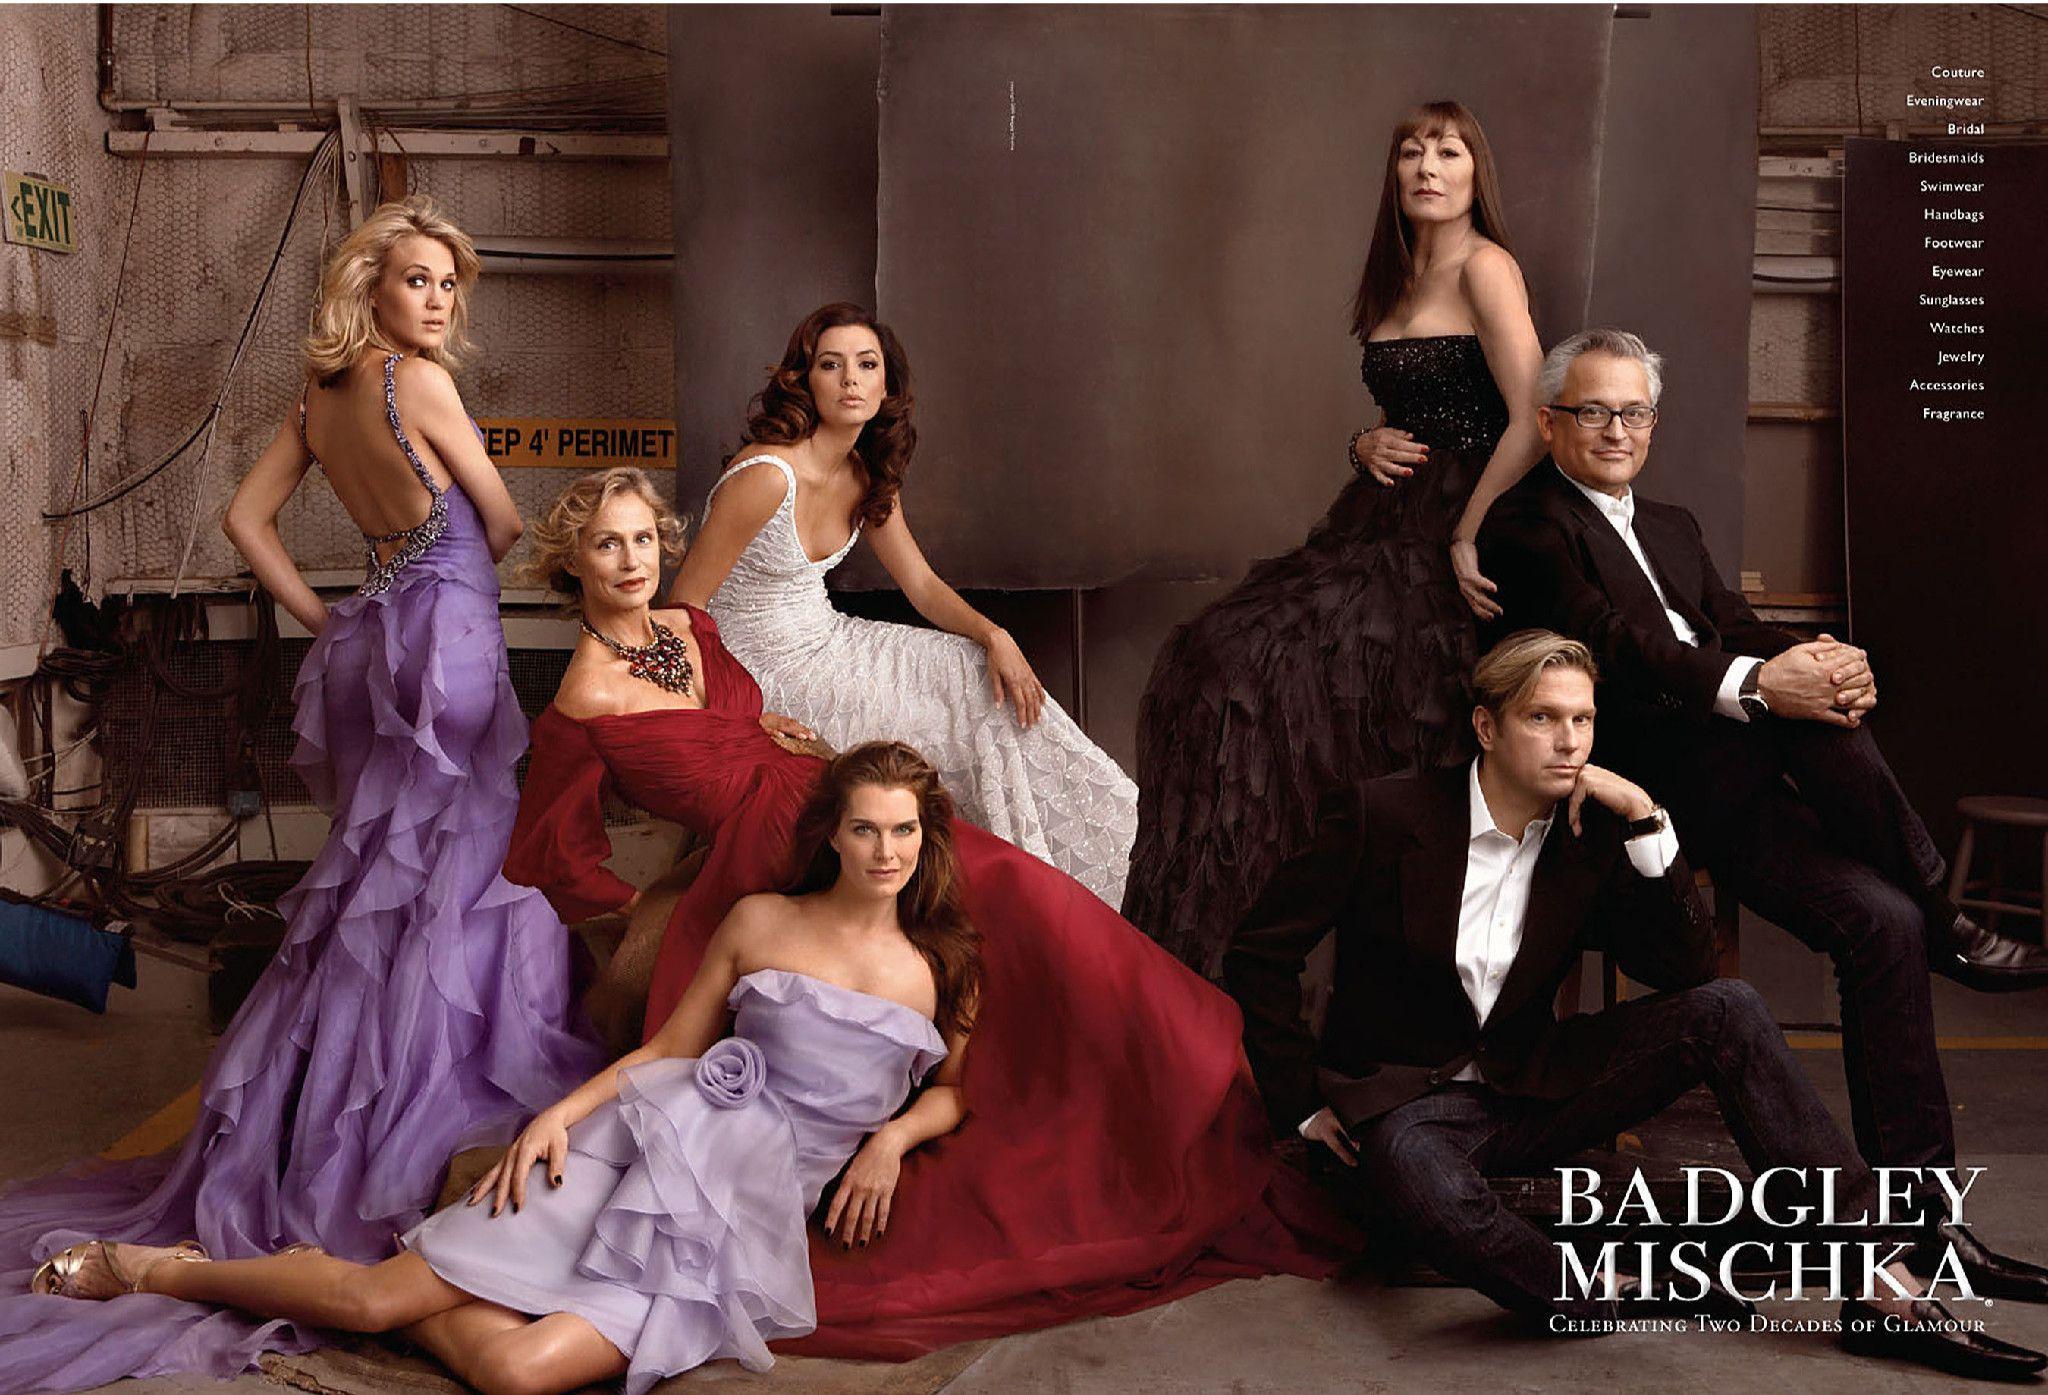 Badgley Mischka Celebrating Two Decades of Glamour